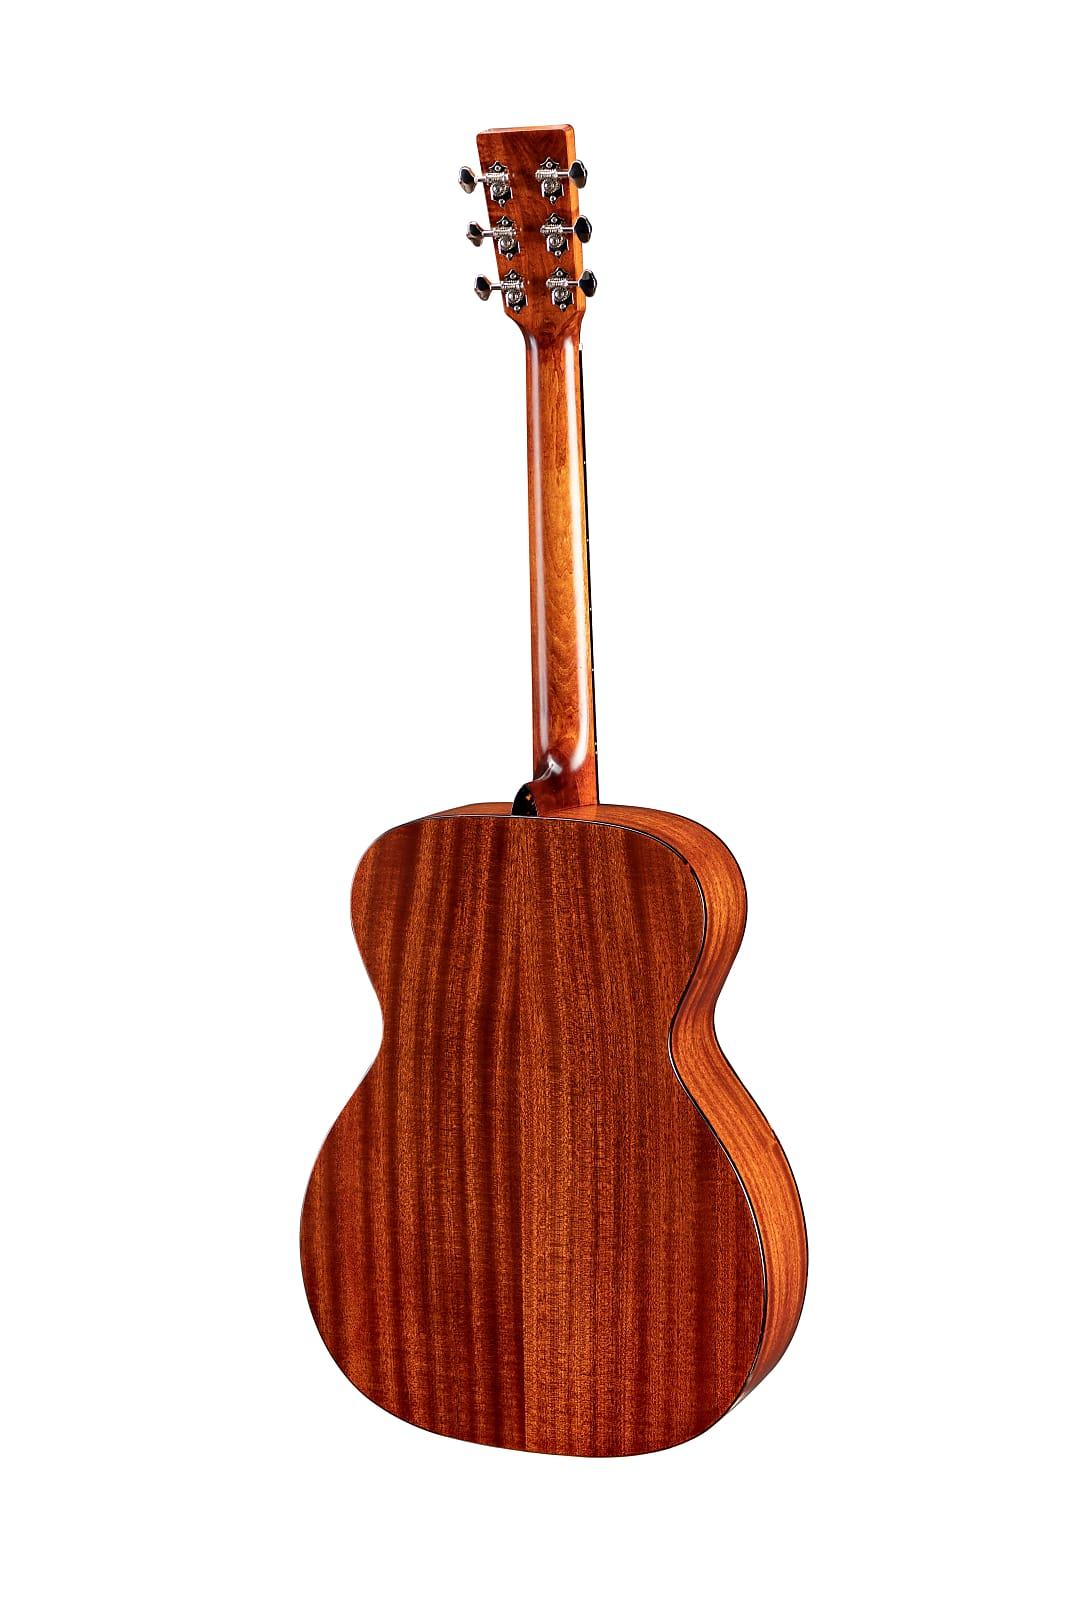 Eastman E2OM Solid Cedar / Sapele Orchestra Model Acoustic Guitar Natural w/ Gi